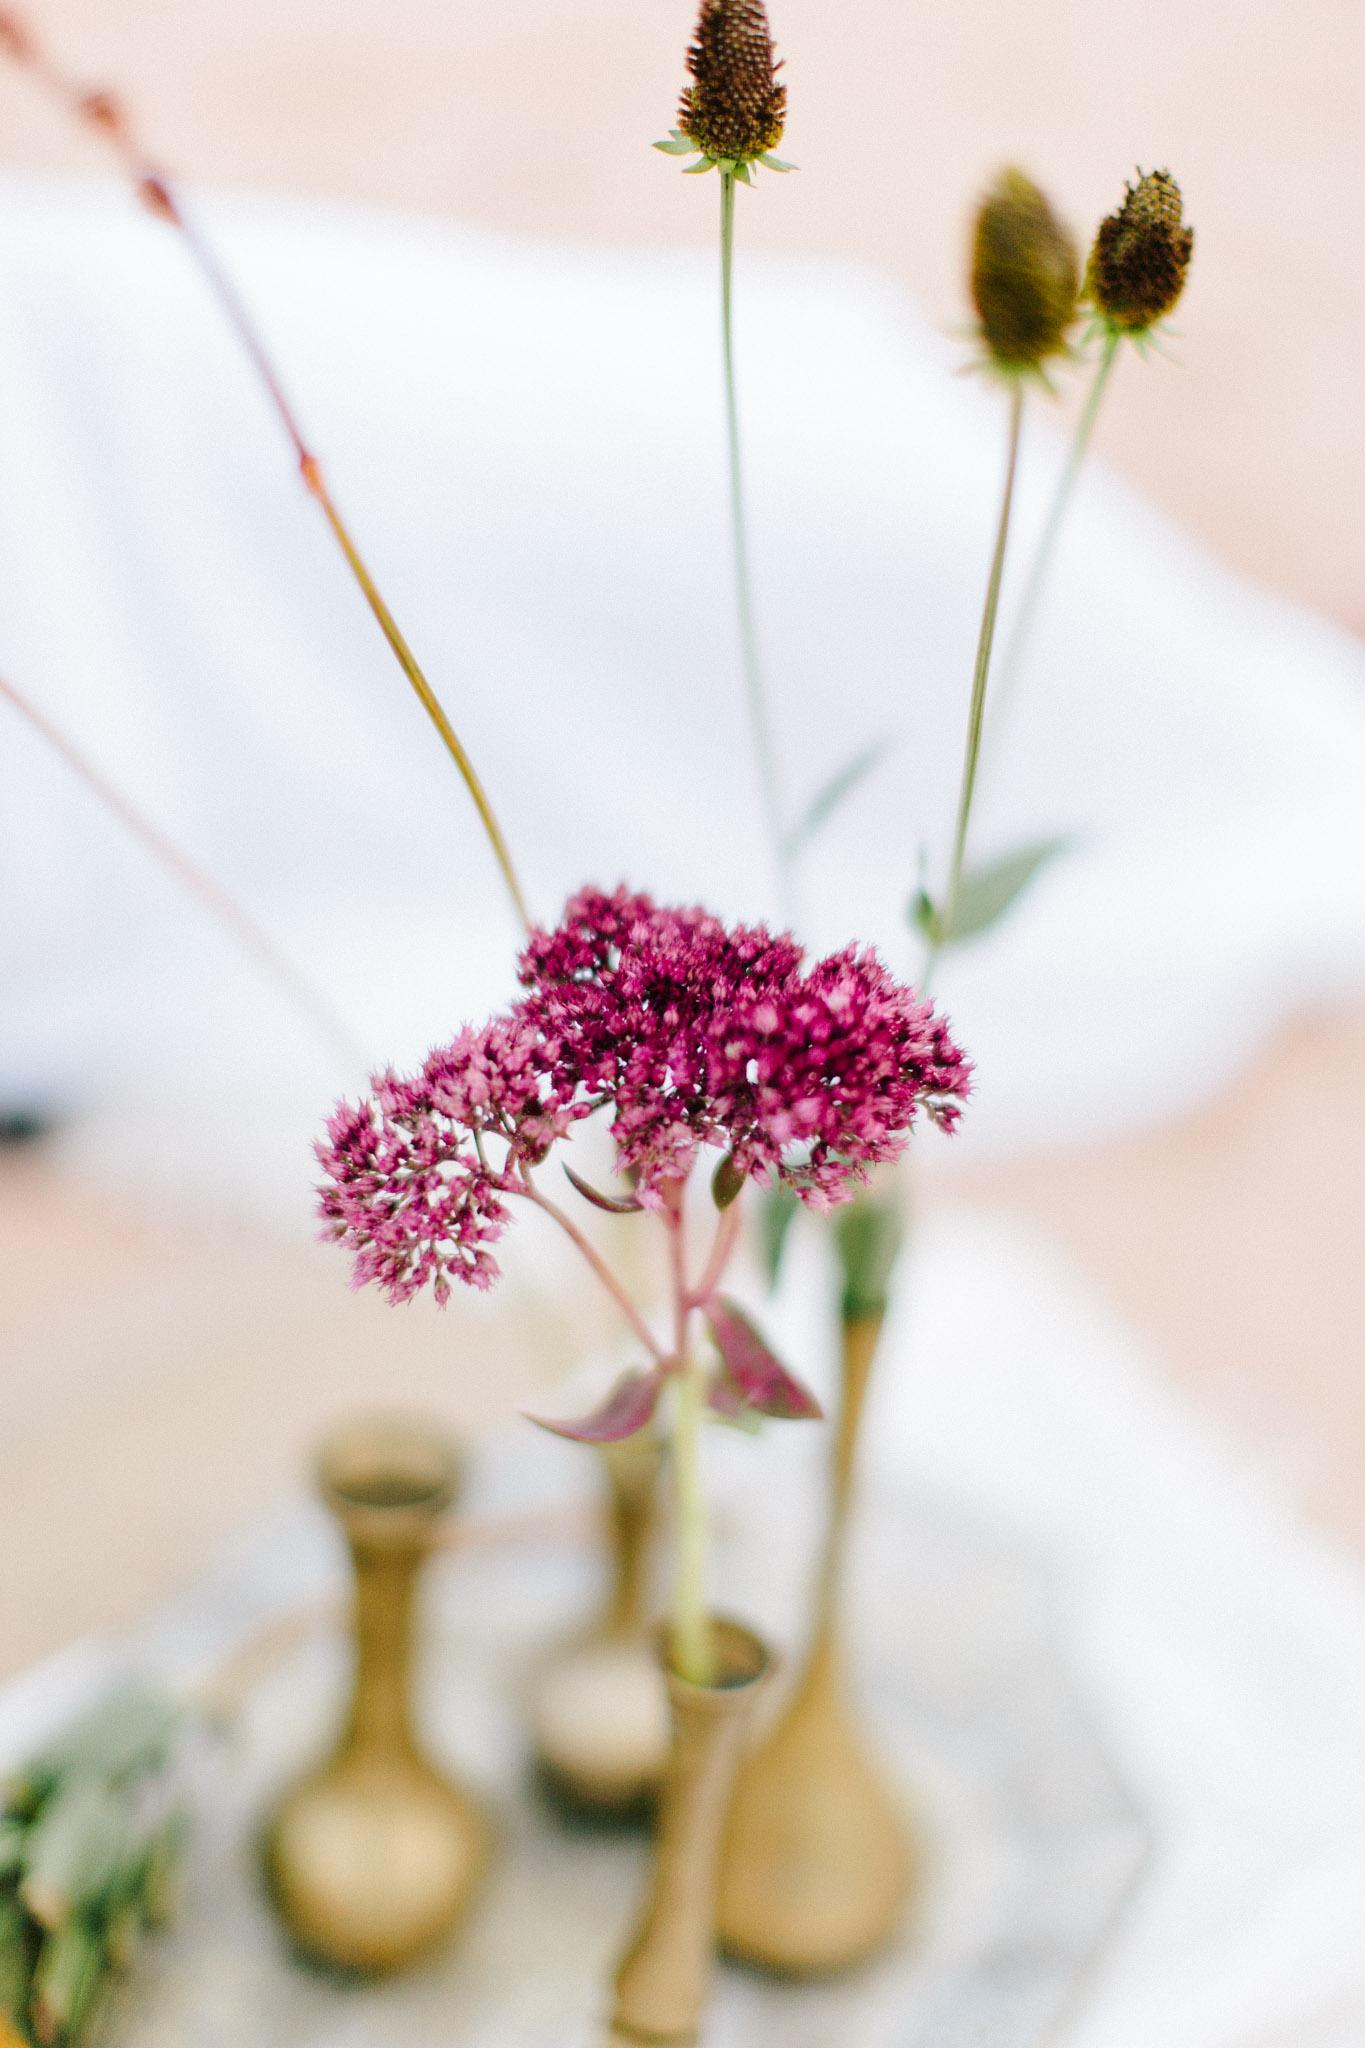 Speyer-Moroccan-Wedding-Inspiration-Pia-Anna-Christian-Wedding-Photography-S-40.jpg